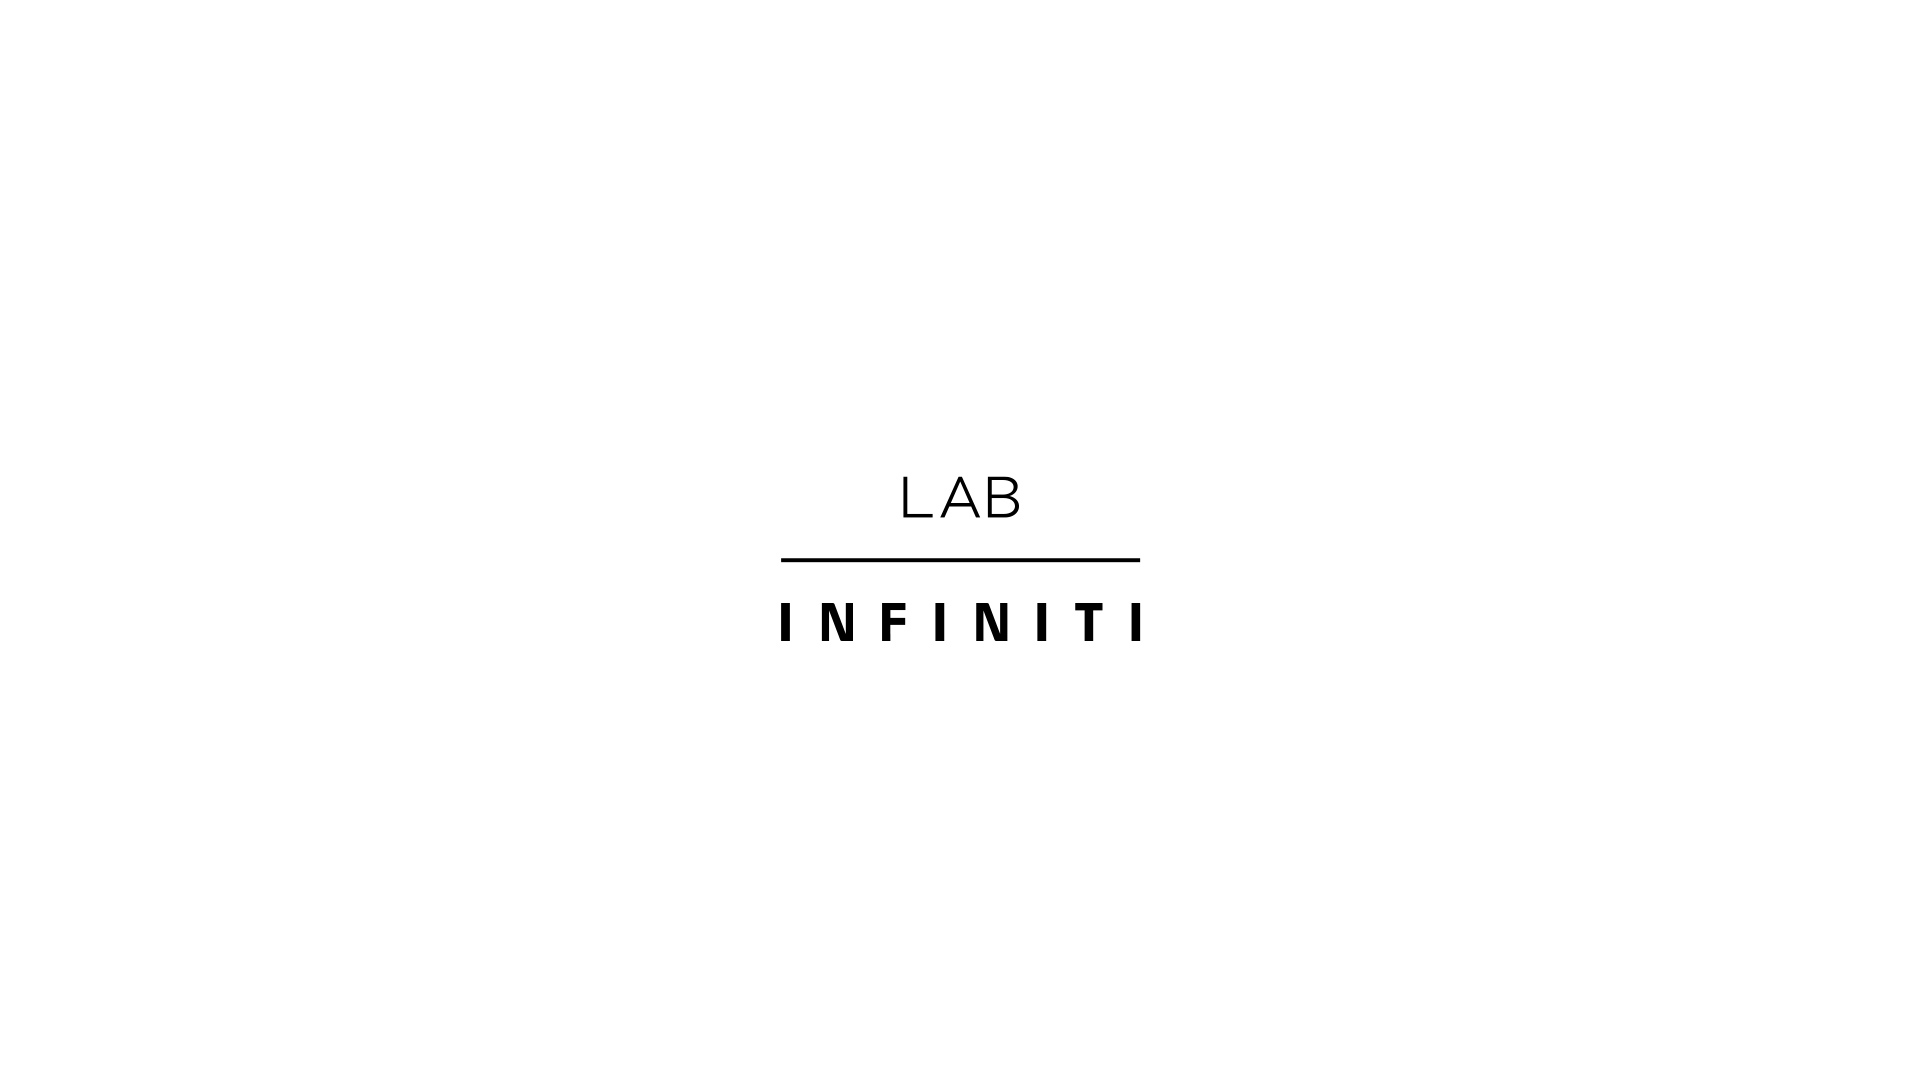 Infiniti Lab